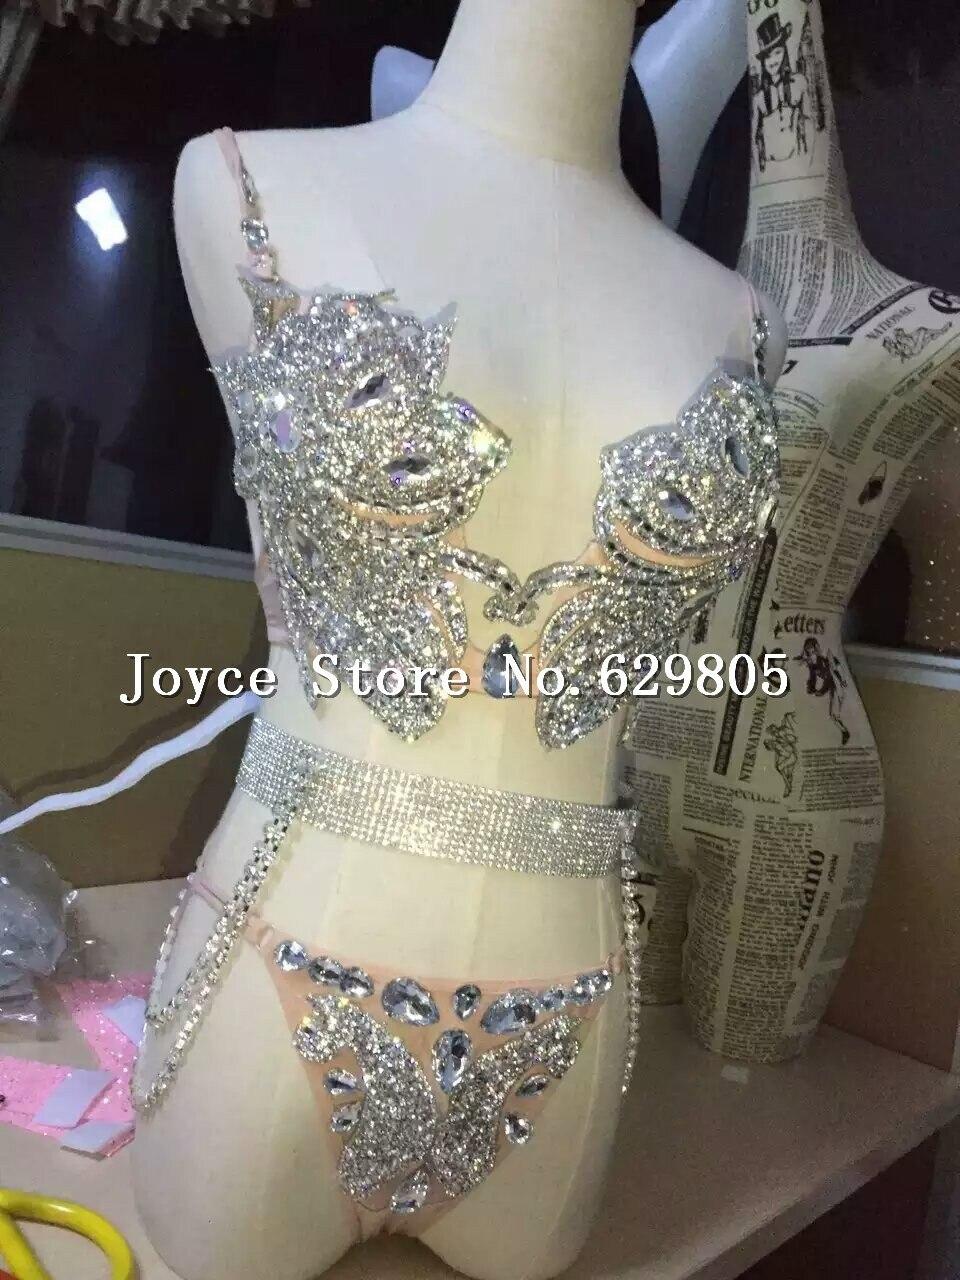 Silver Bright Sexy Bra Low Waist Short Underwear Sequins Dance Wear Two Piece Set Women's Party Dress Female Singer Costume